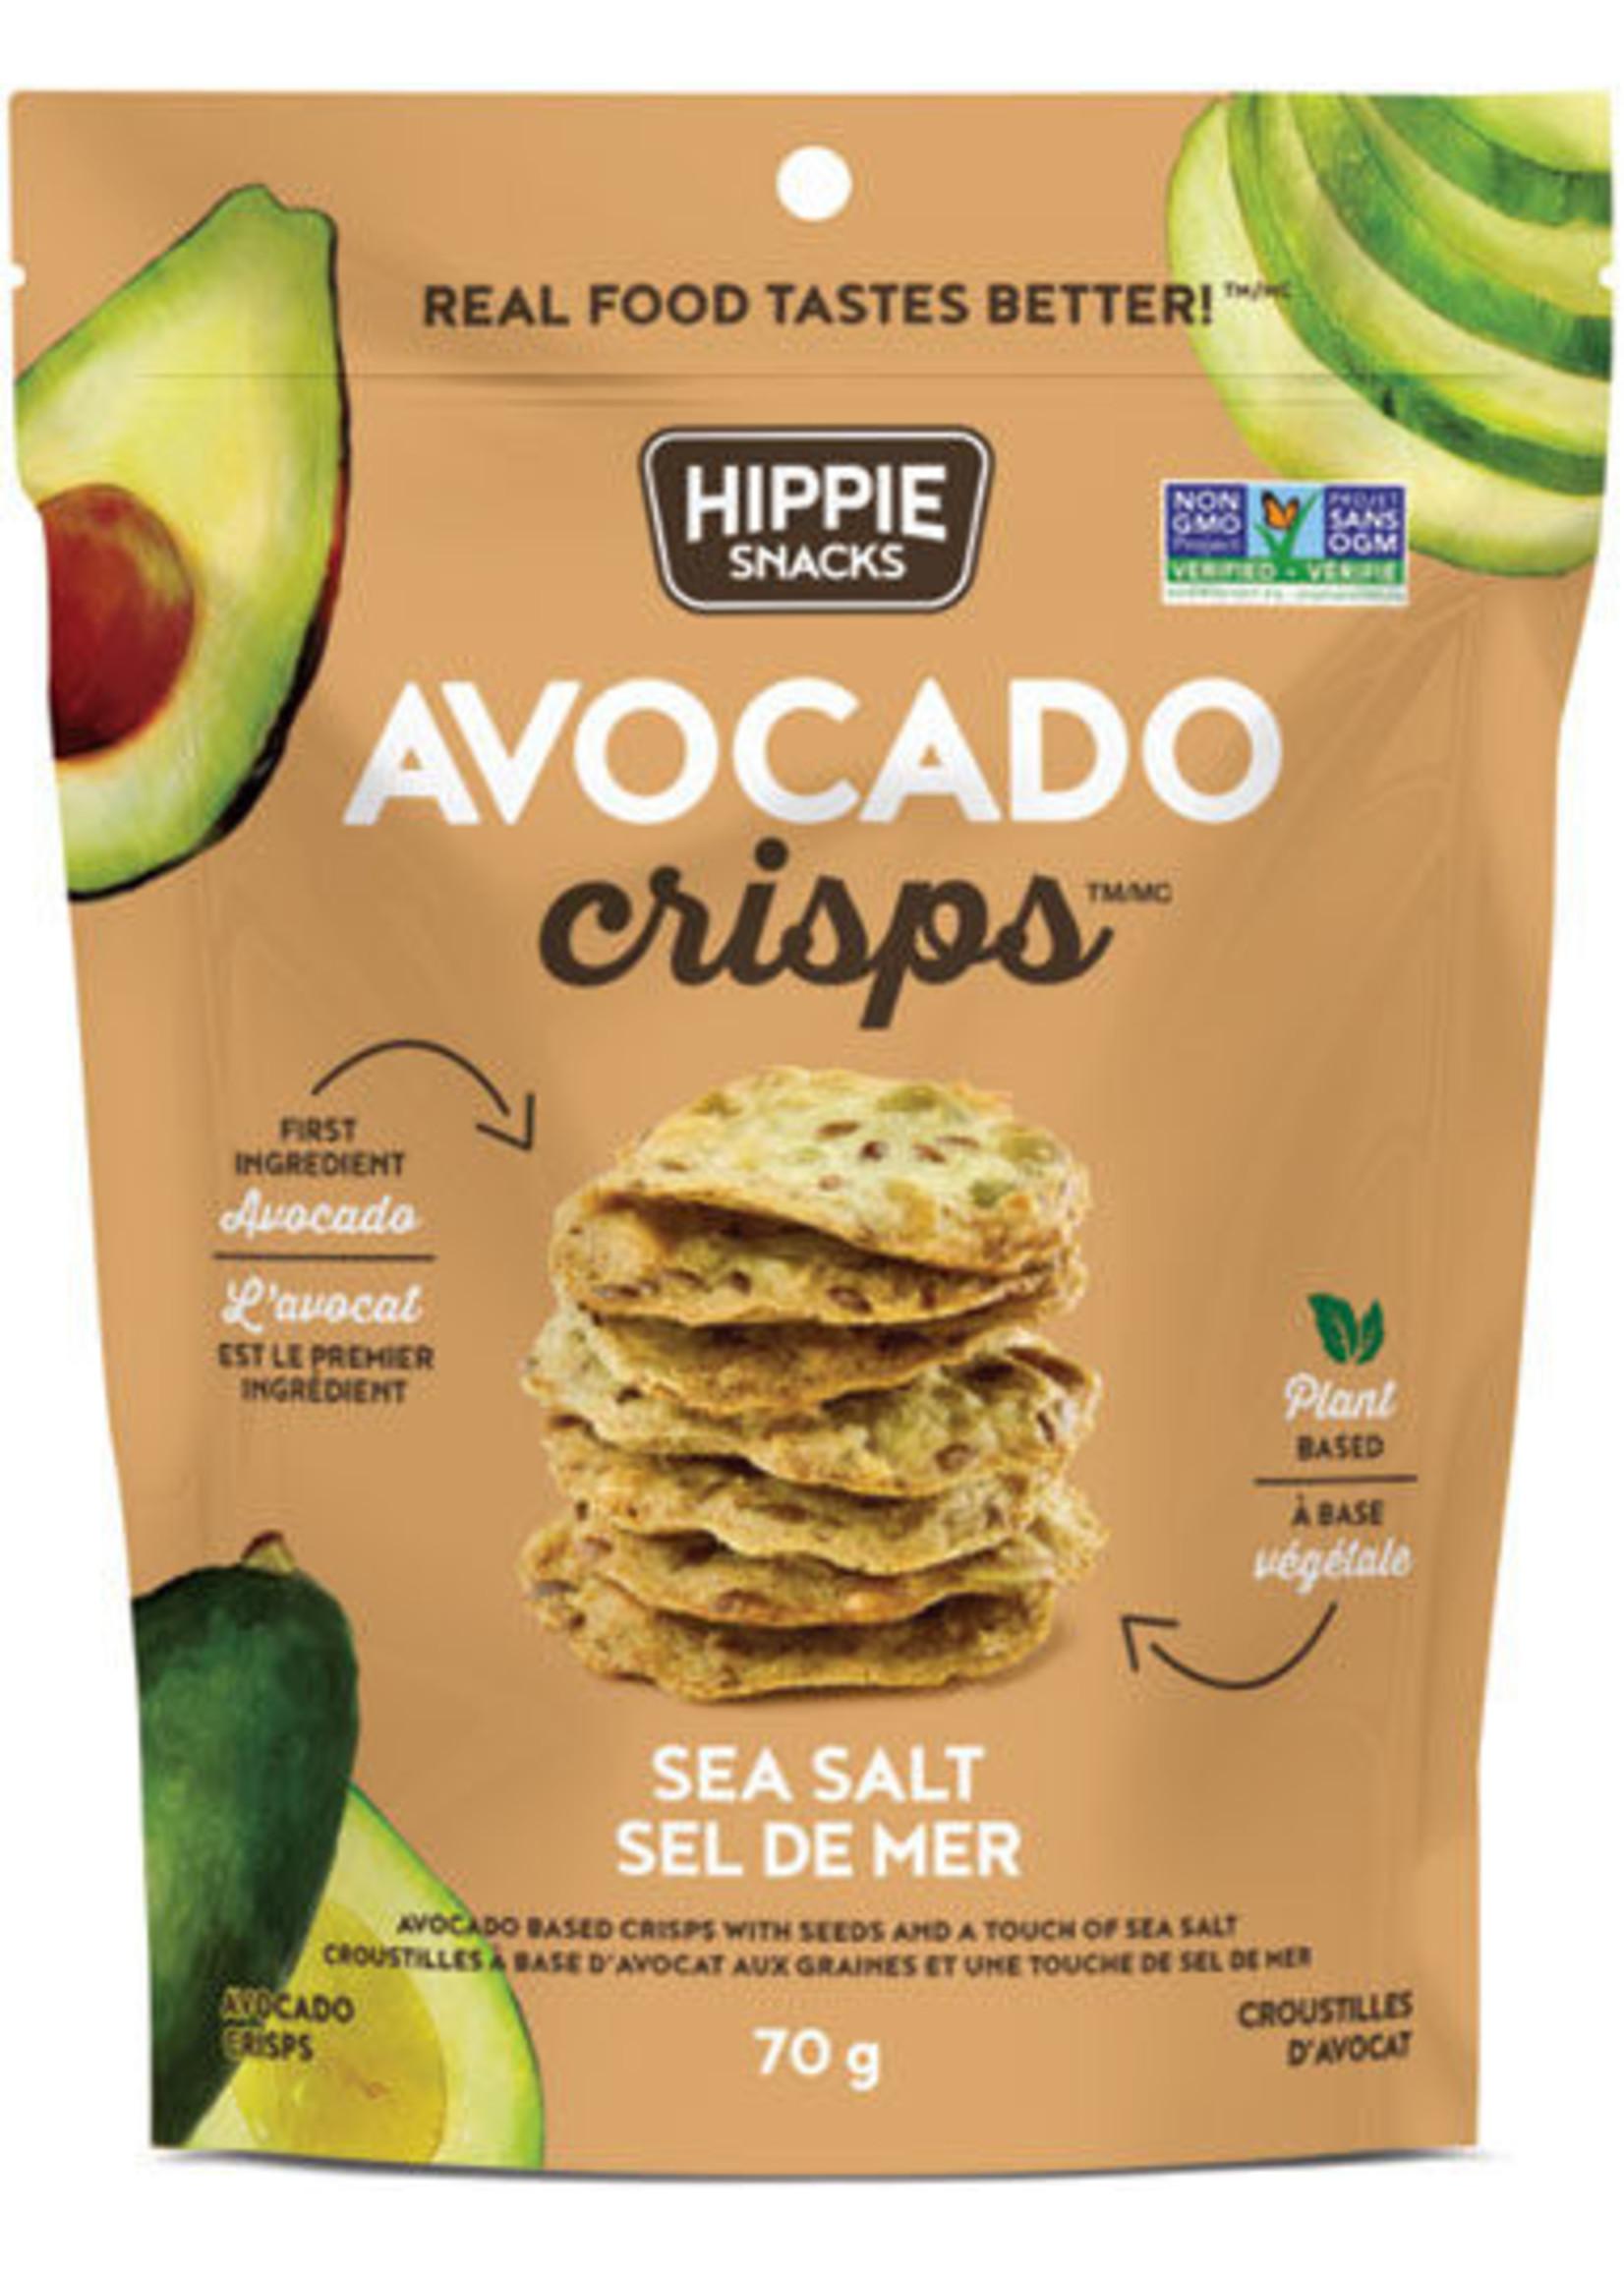 Hippie Snacks Avocado Crisps SEA SALT